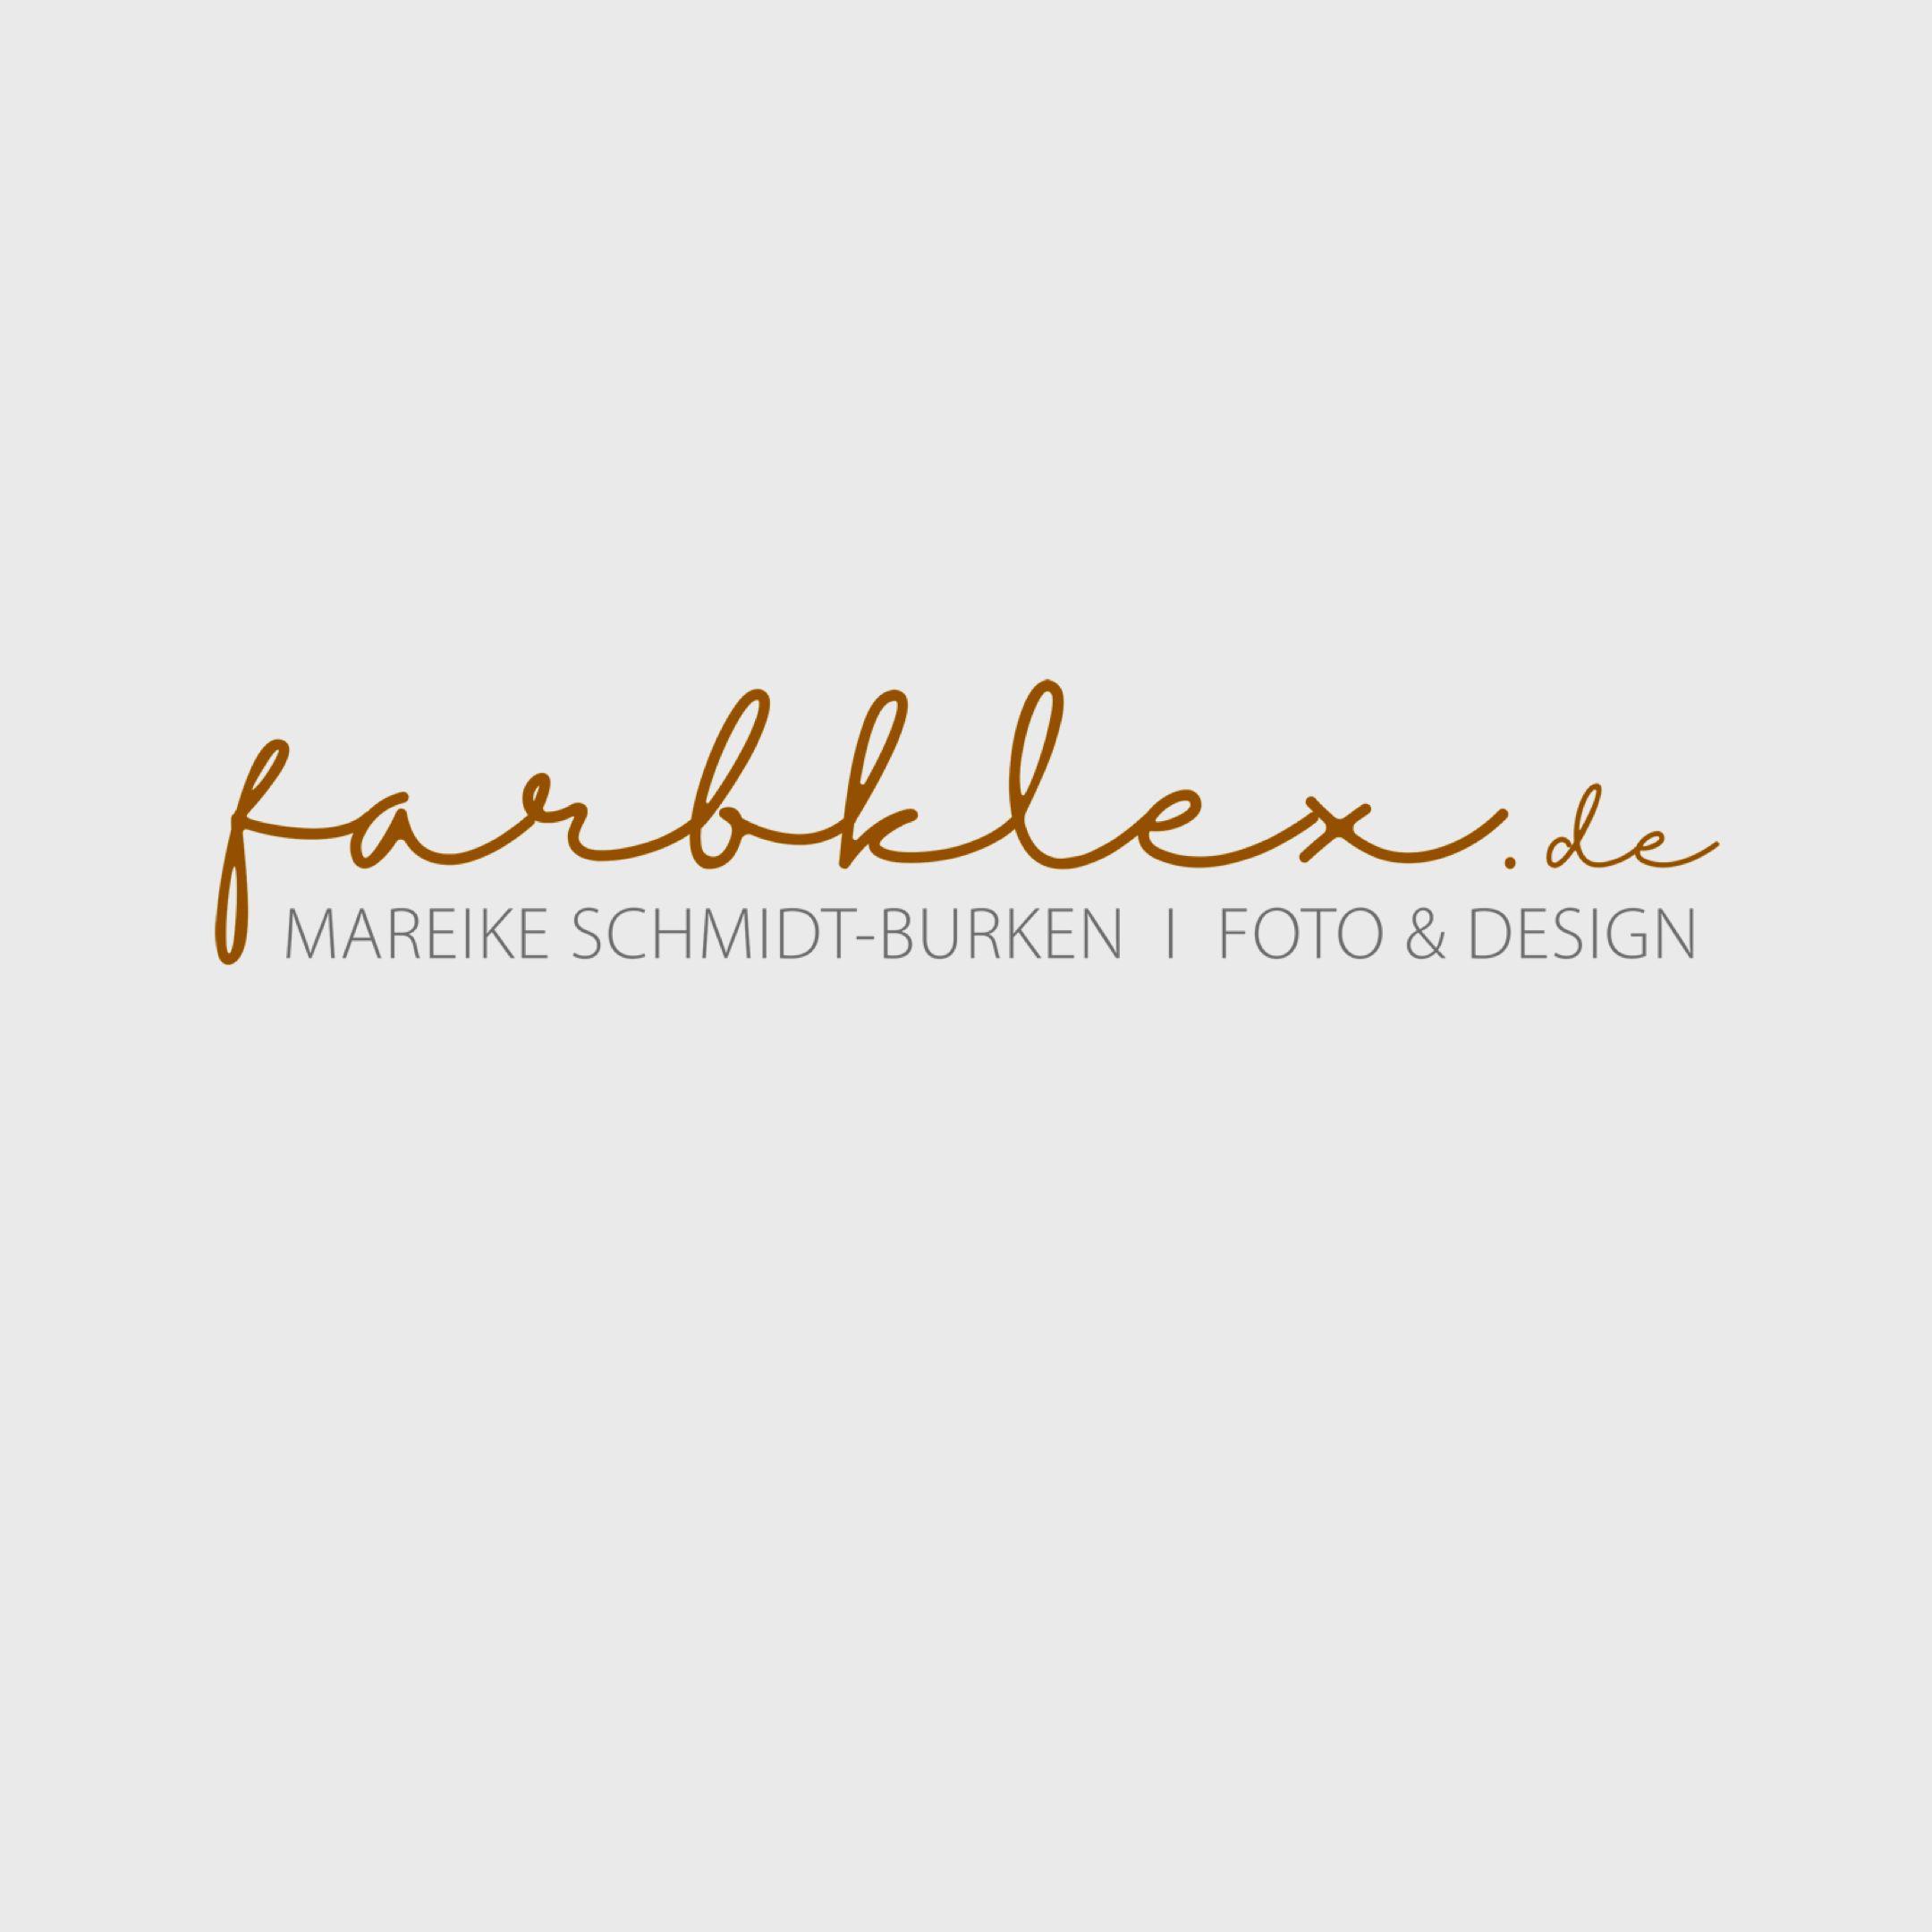 farbklex | foto & design